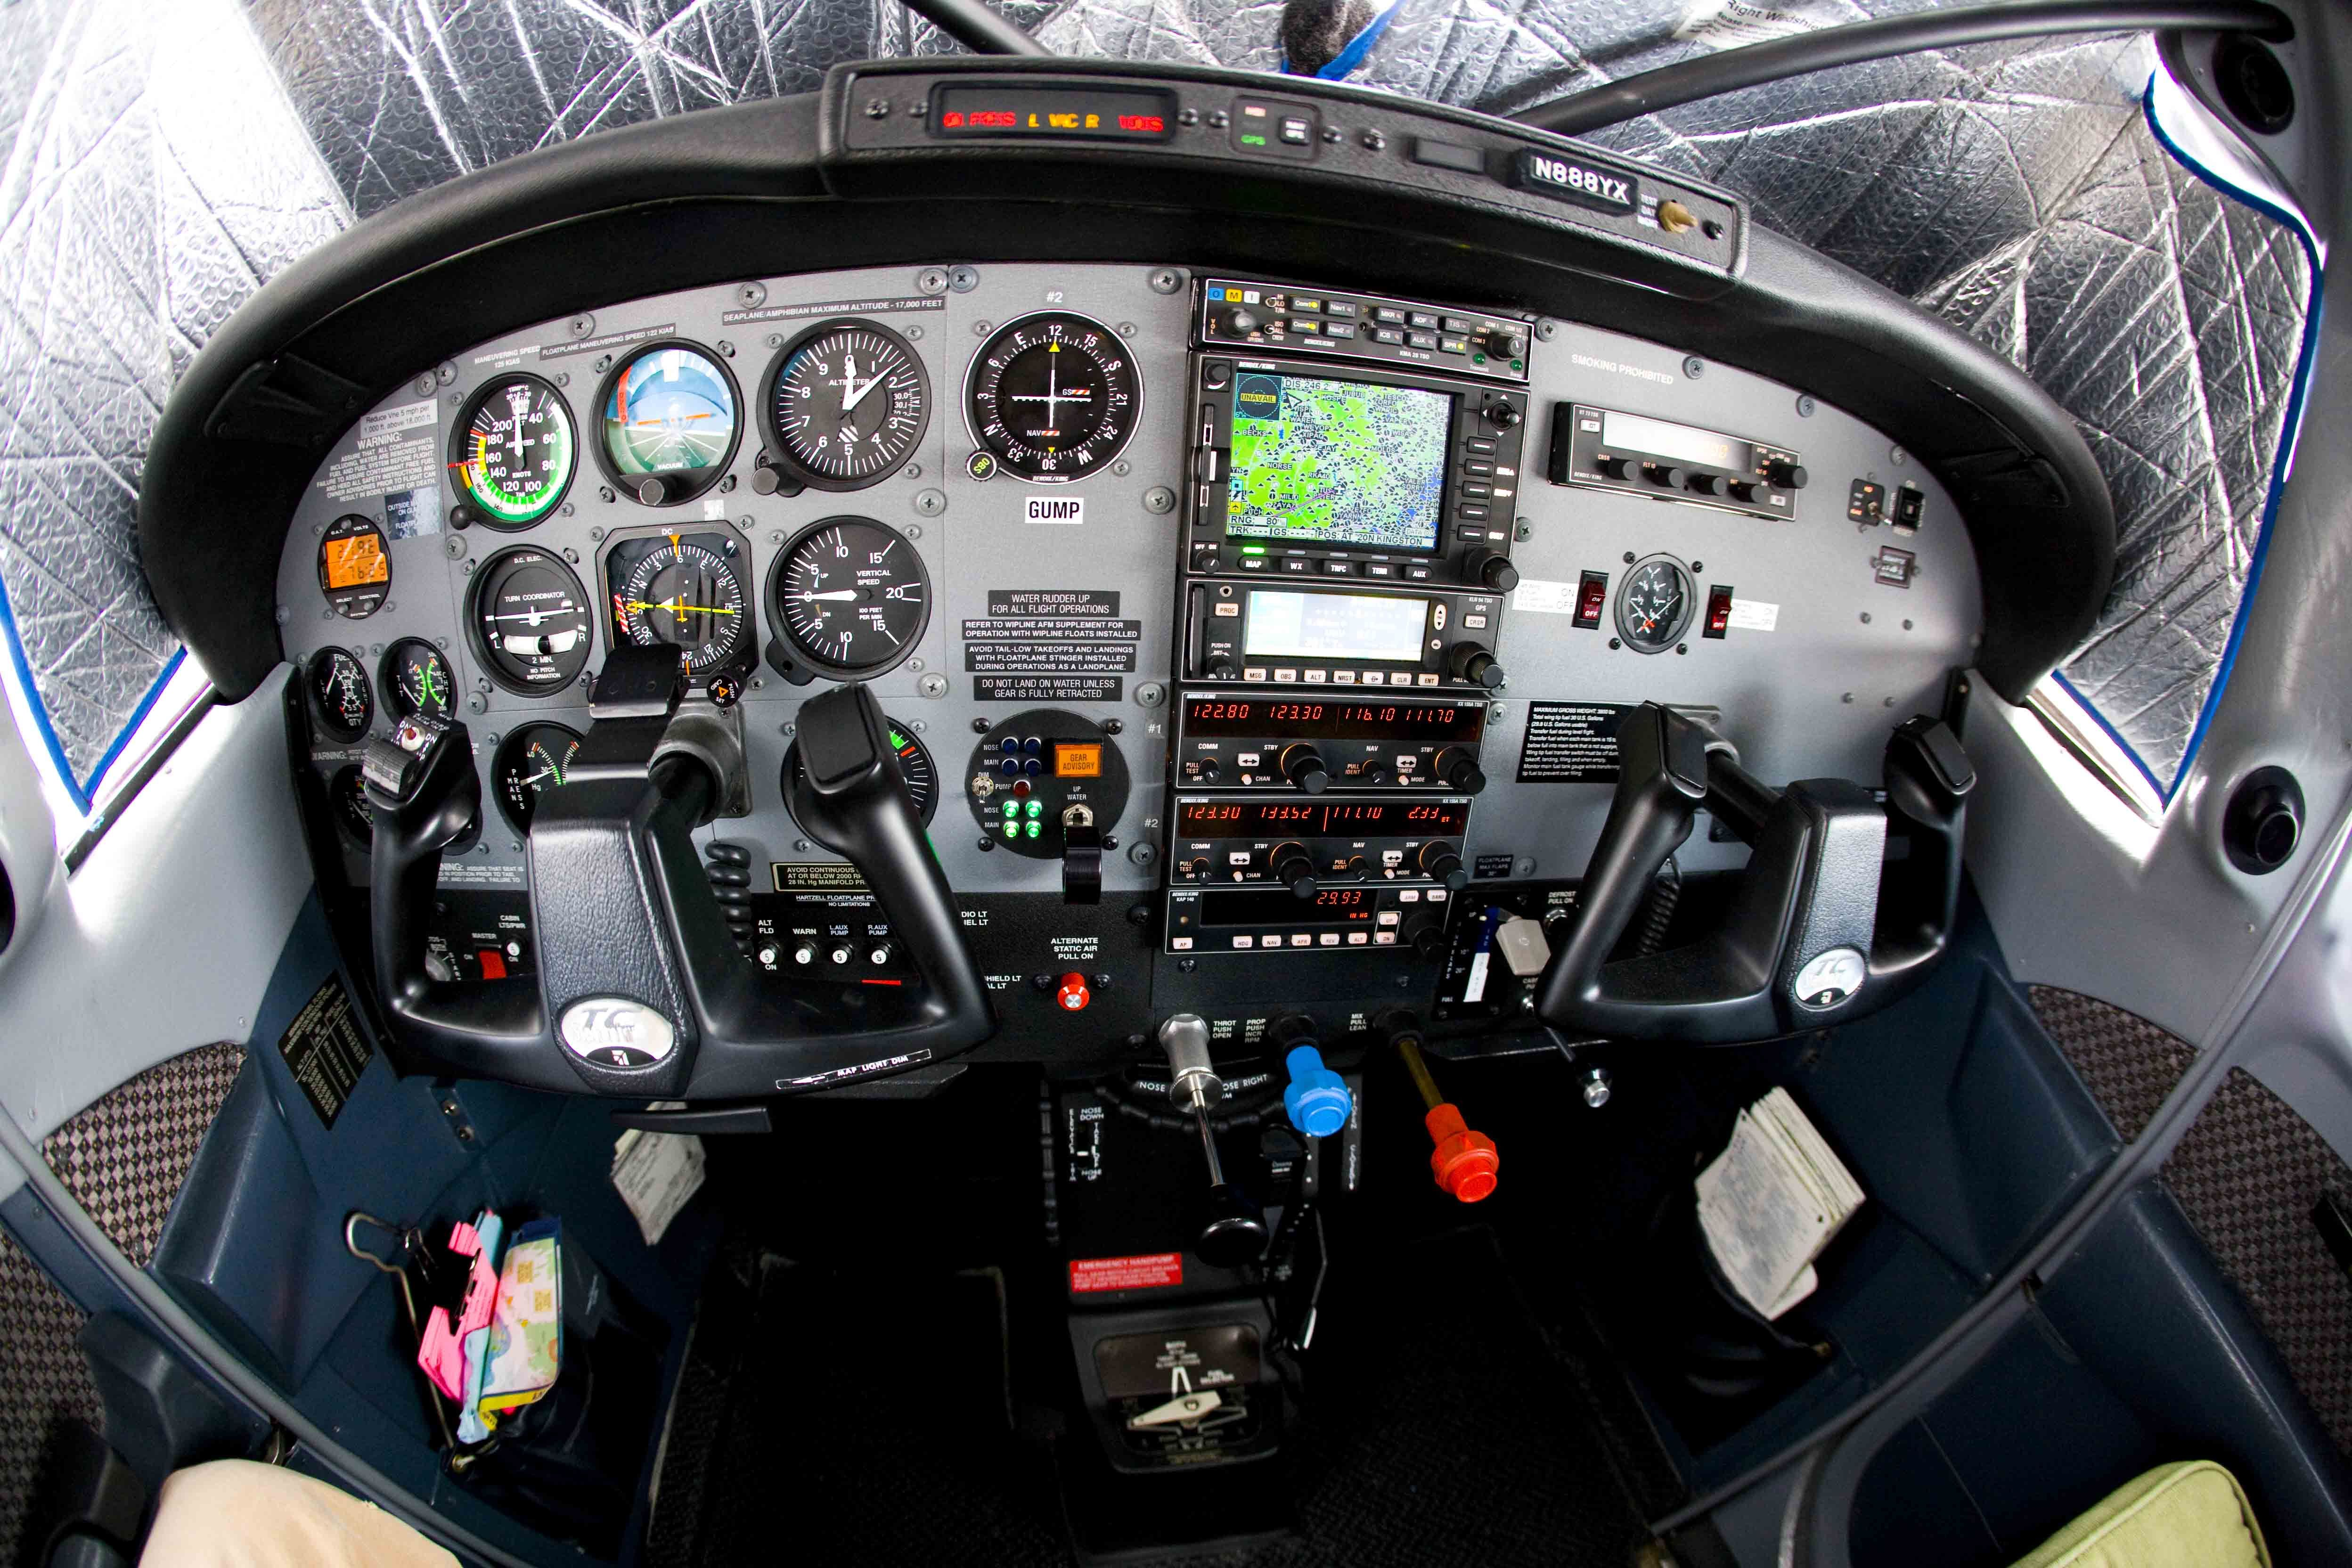 Matt's Cessna 206 instrument panel in EDGE OF TRUST